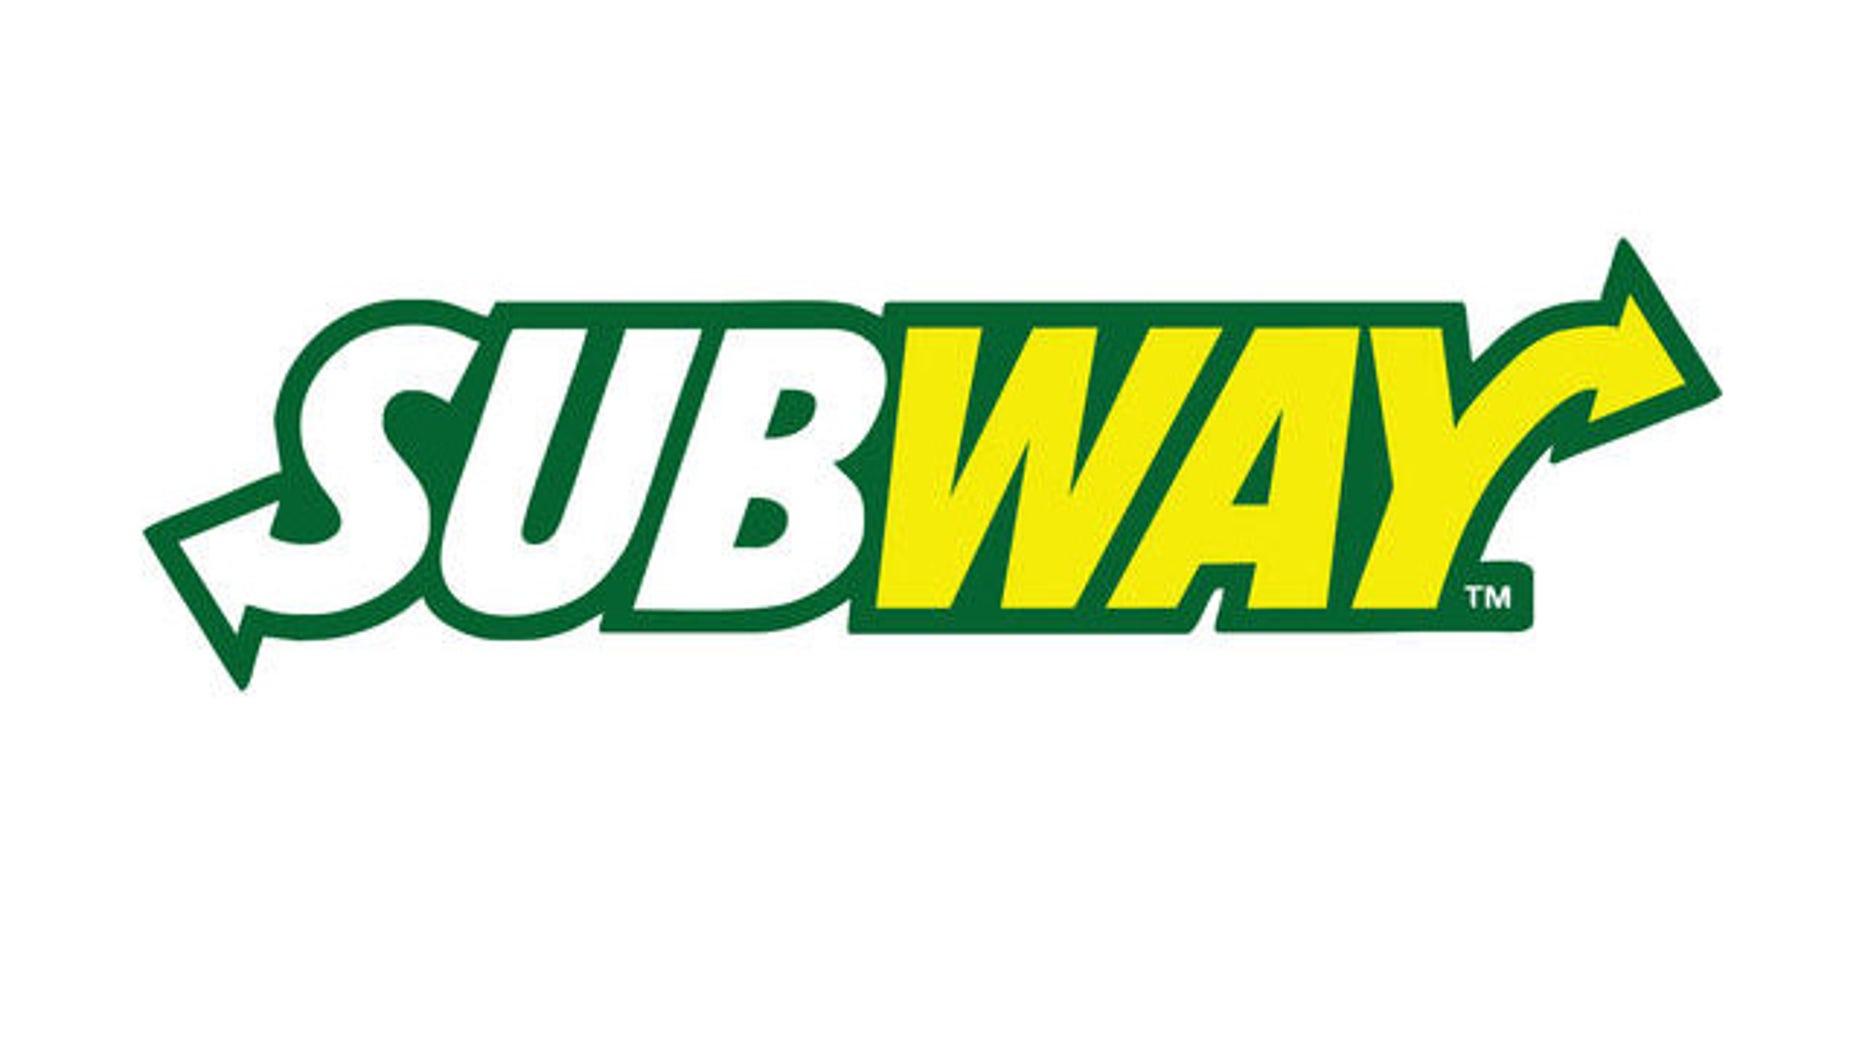 June 14, 2012: Subway unveils three new vegan sandwiches at select U.S. locations.